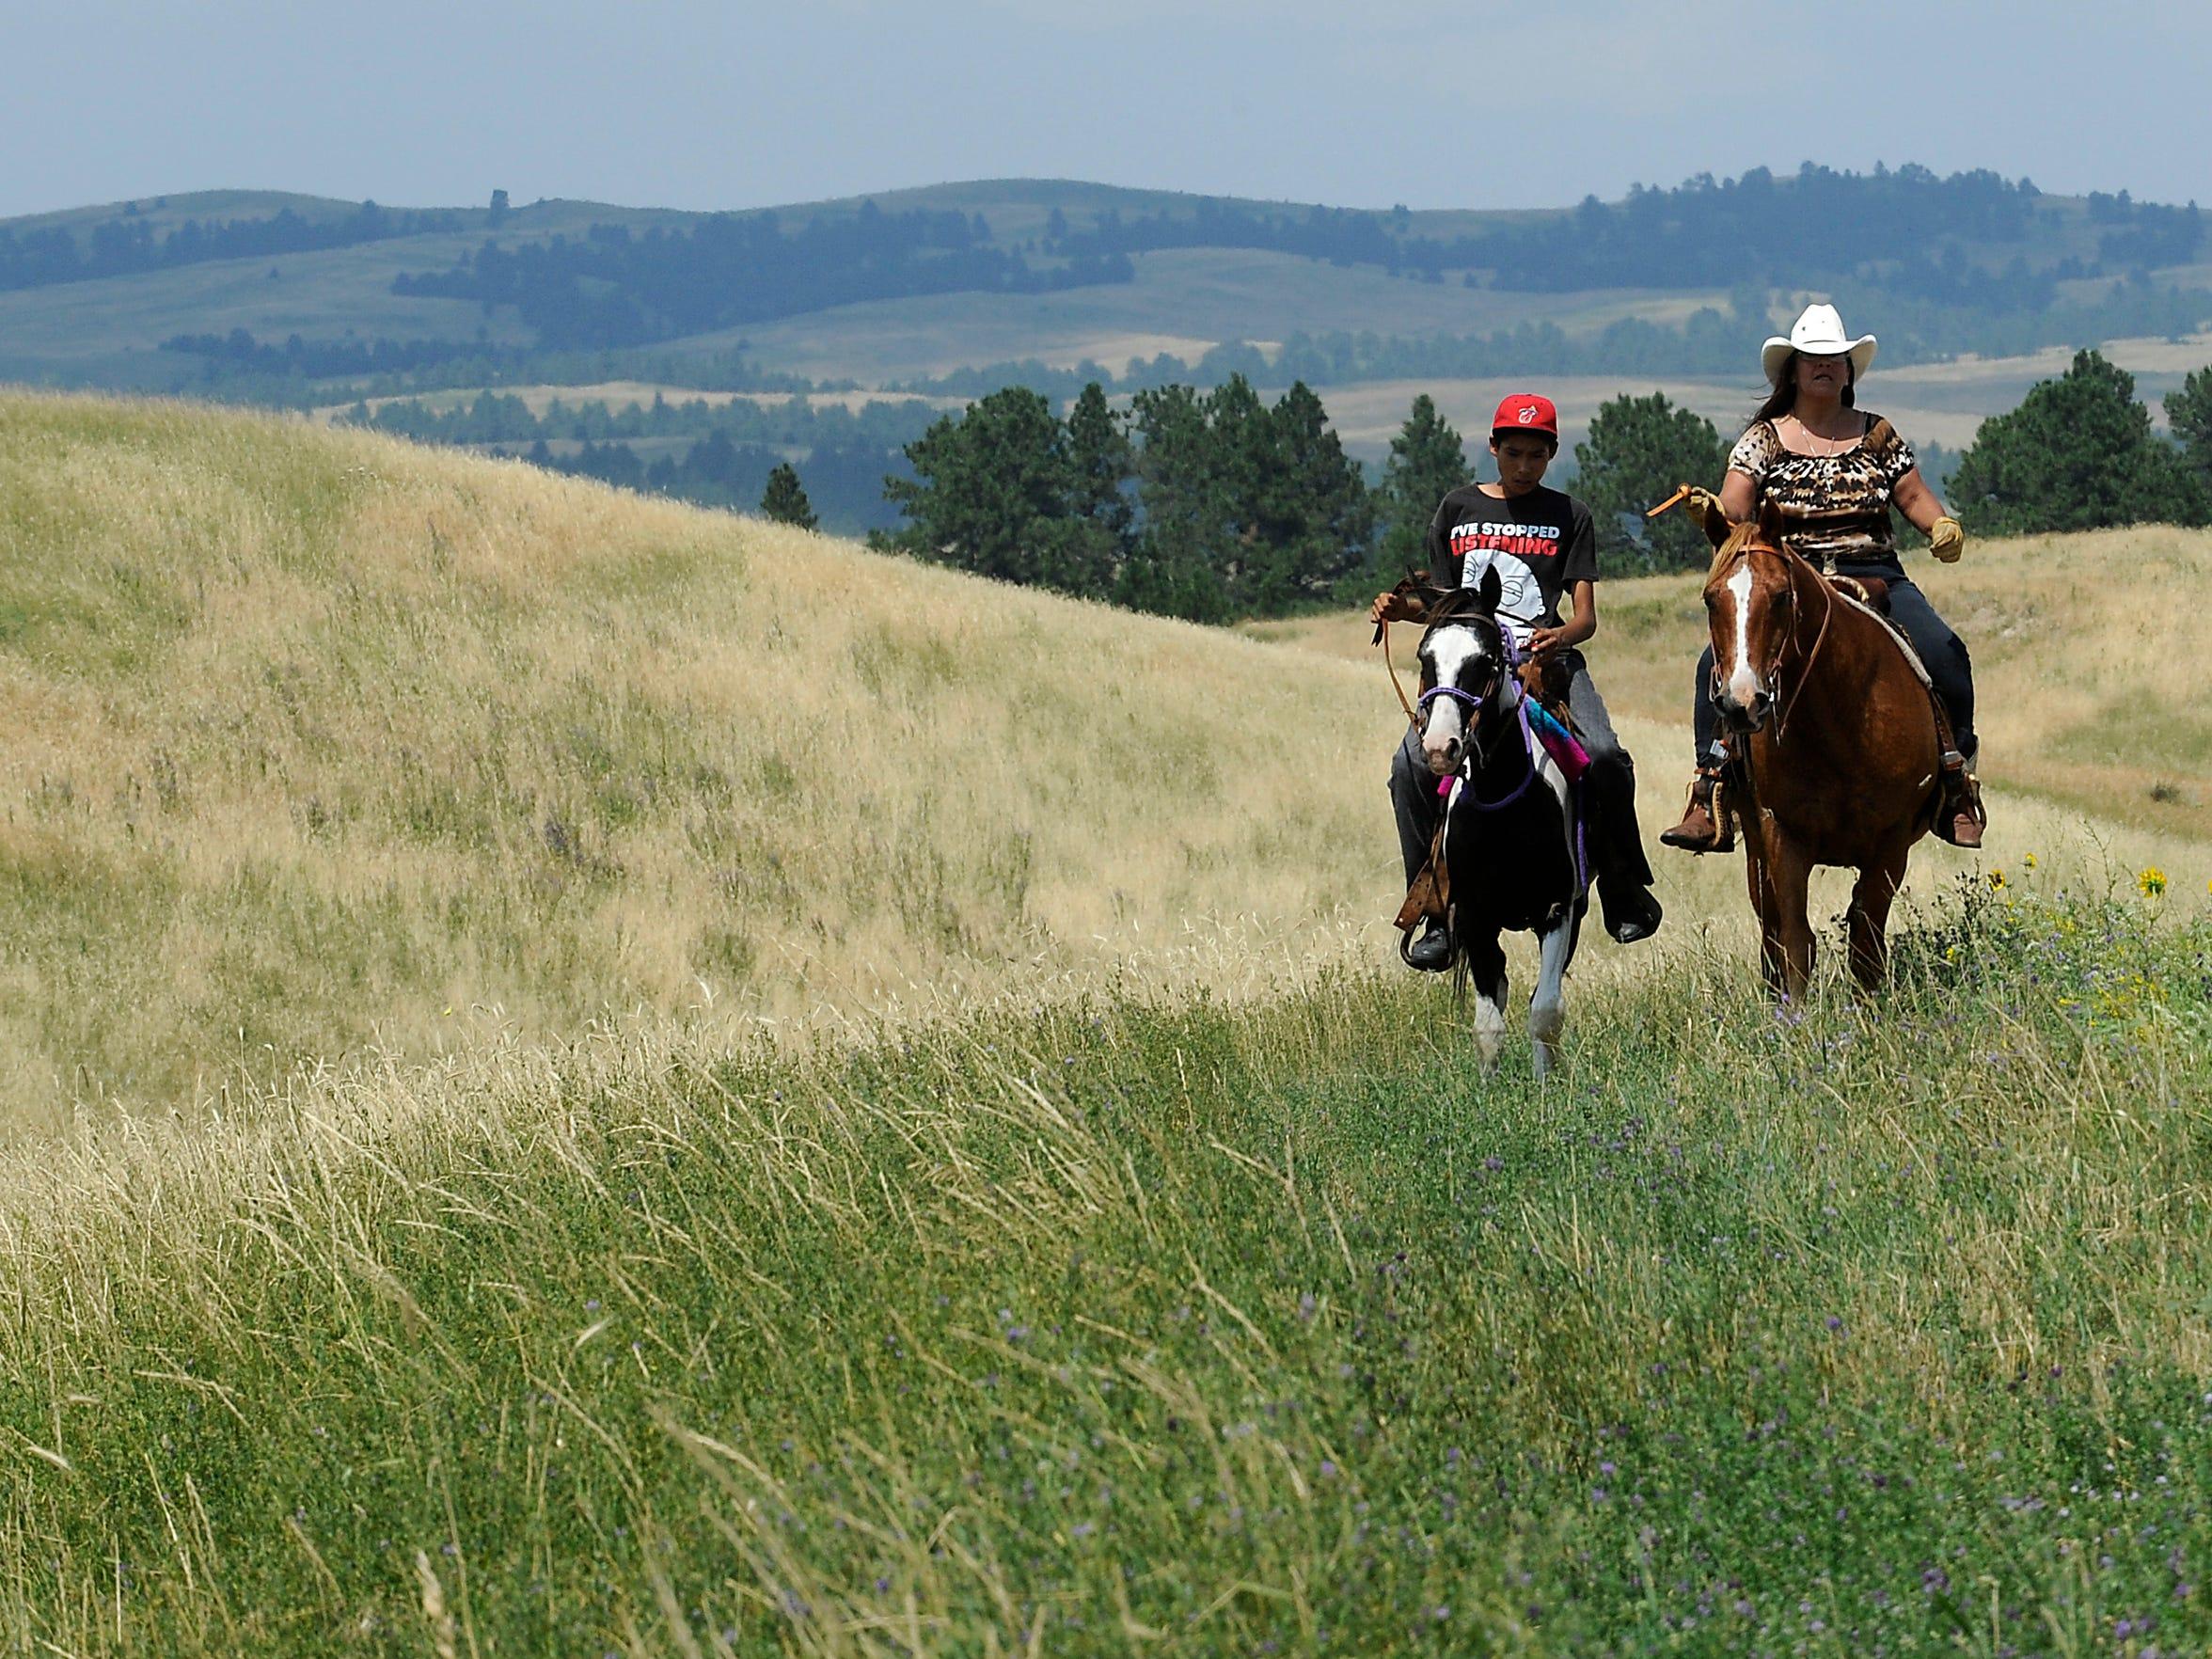 Charles Marshall, 14, and Mae Rodriguez ride horse